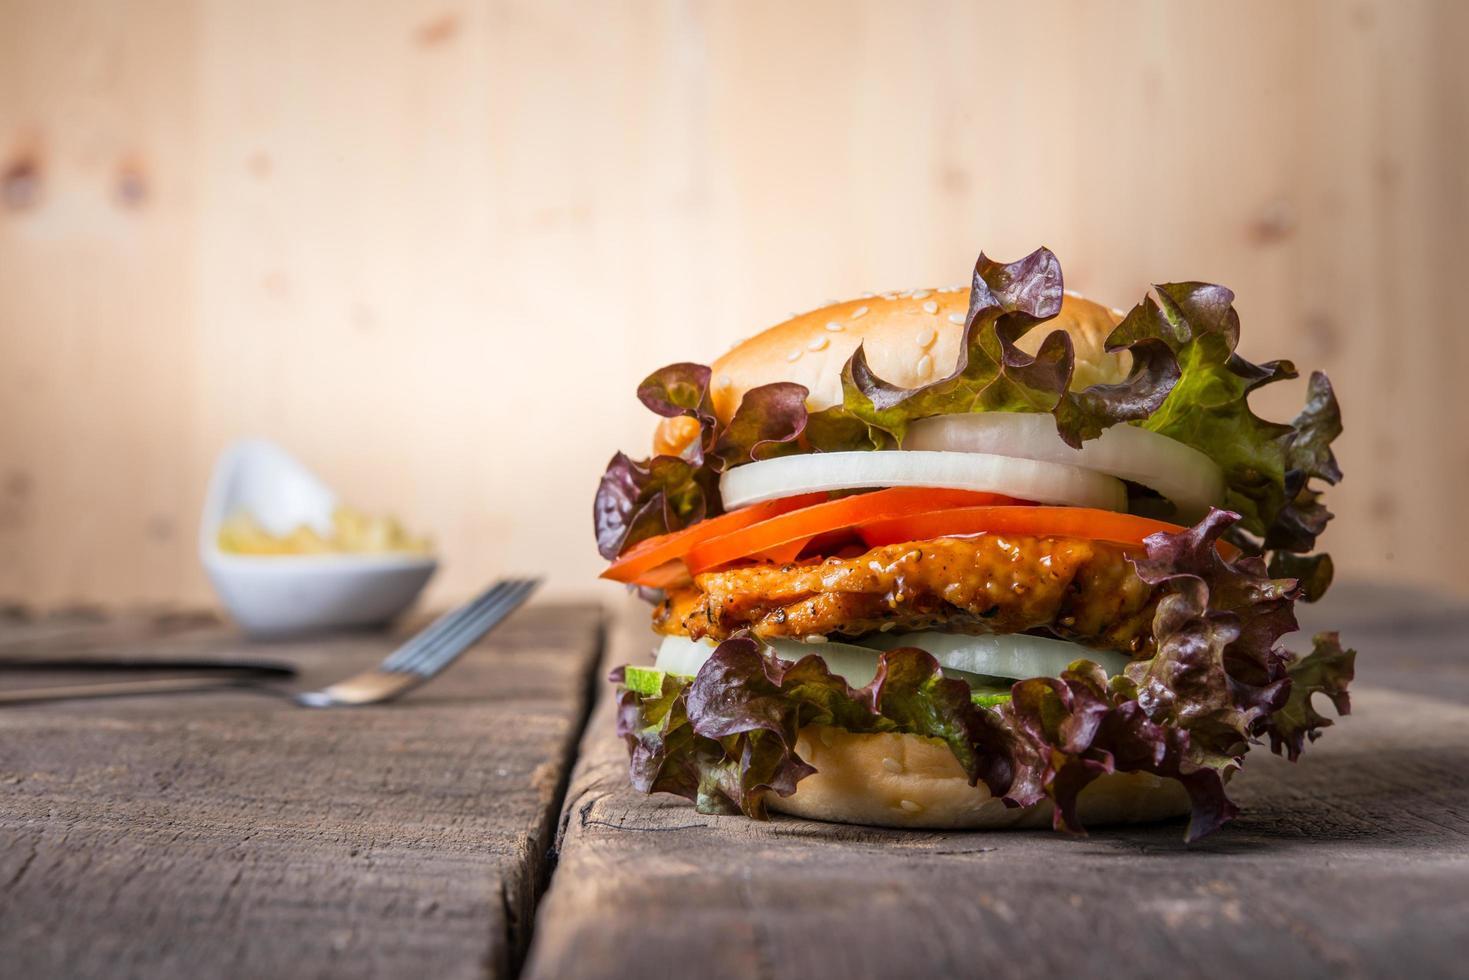 Homemade chicken burger photo